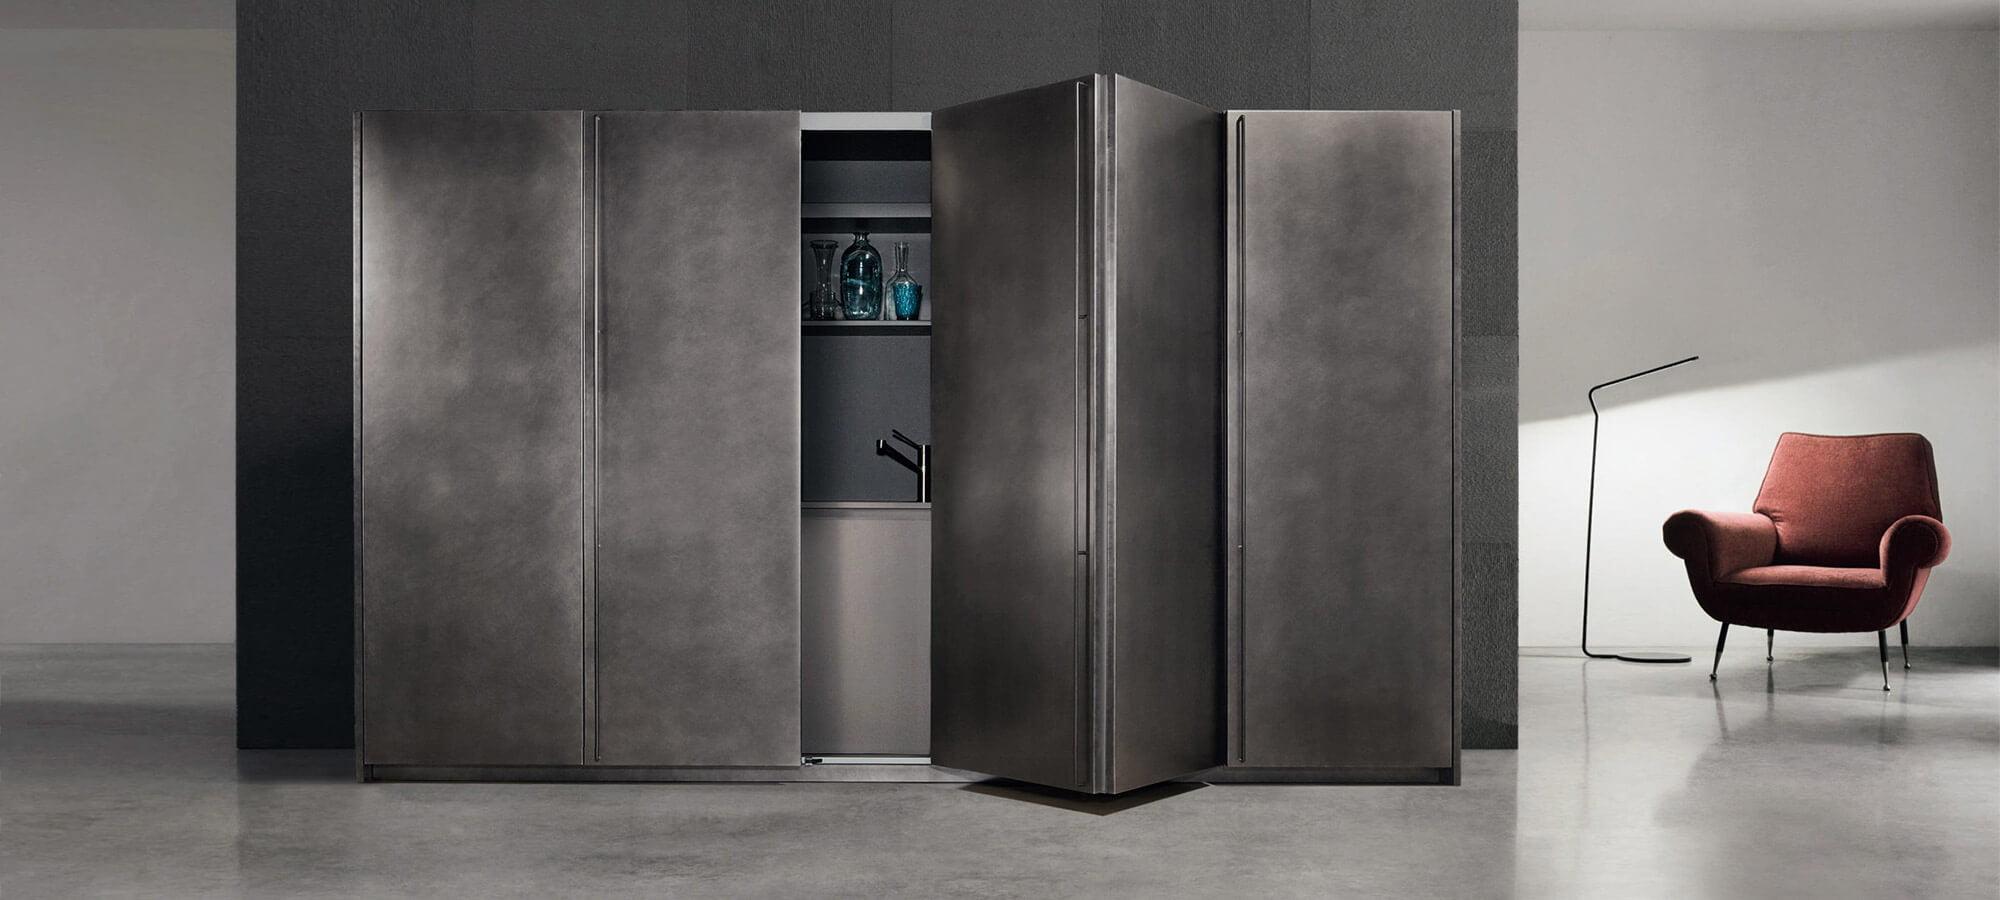 System-Kitchen-002